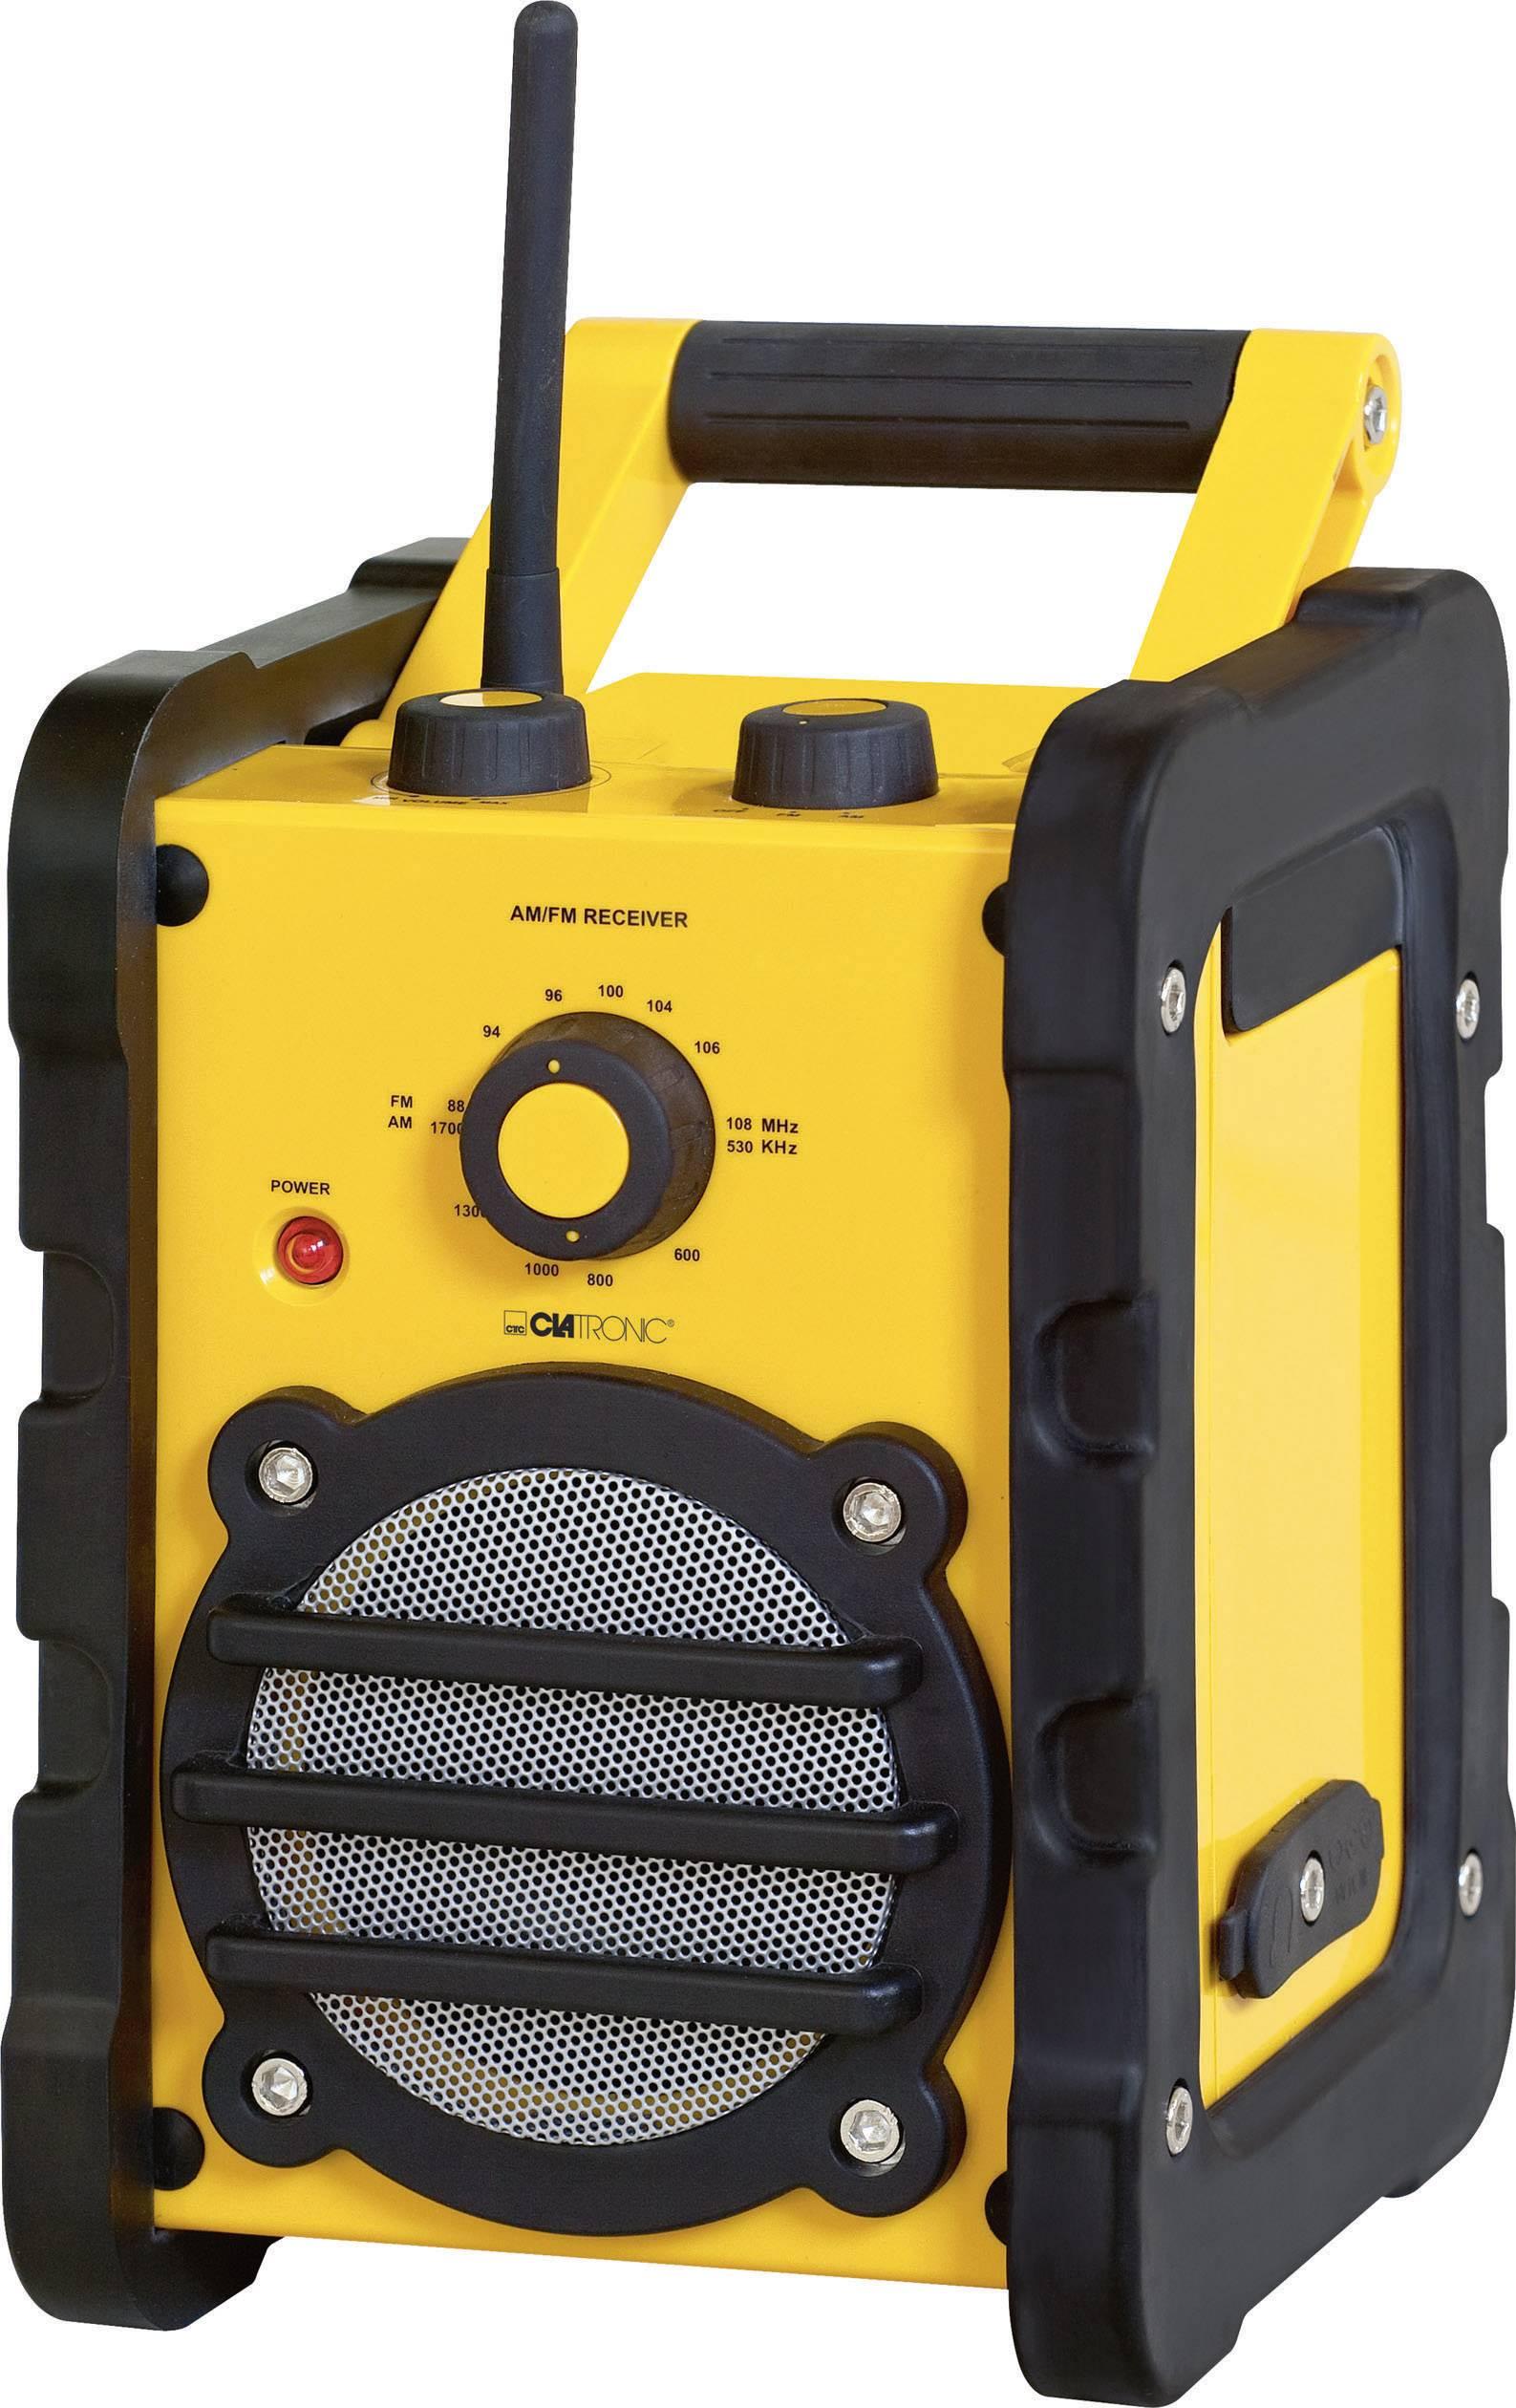 FM outdoorové rádio Clatronic BR 816, AUX, MW, UKW, žltá, čierna